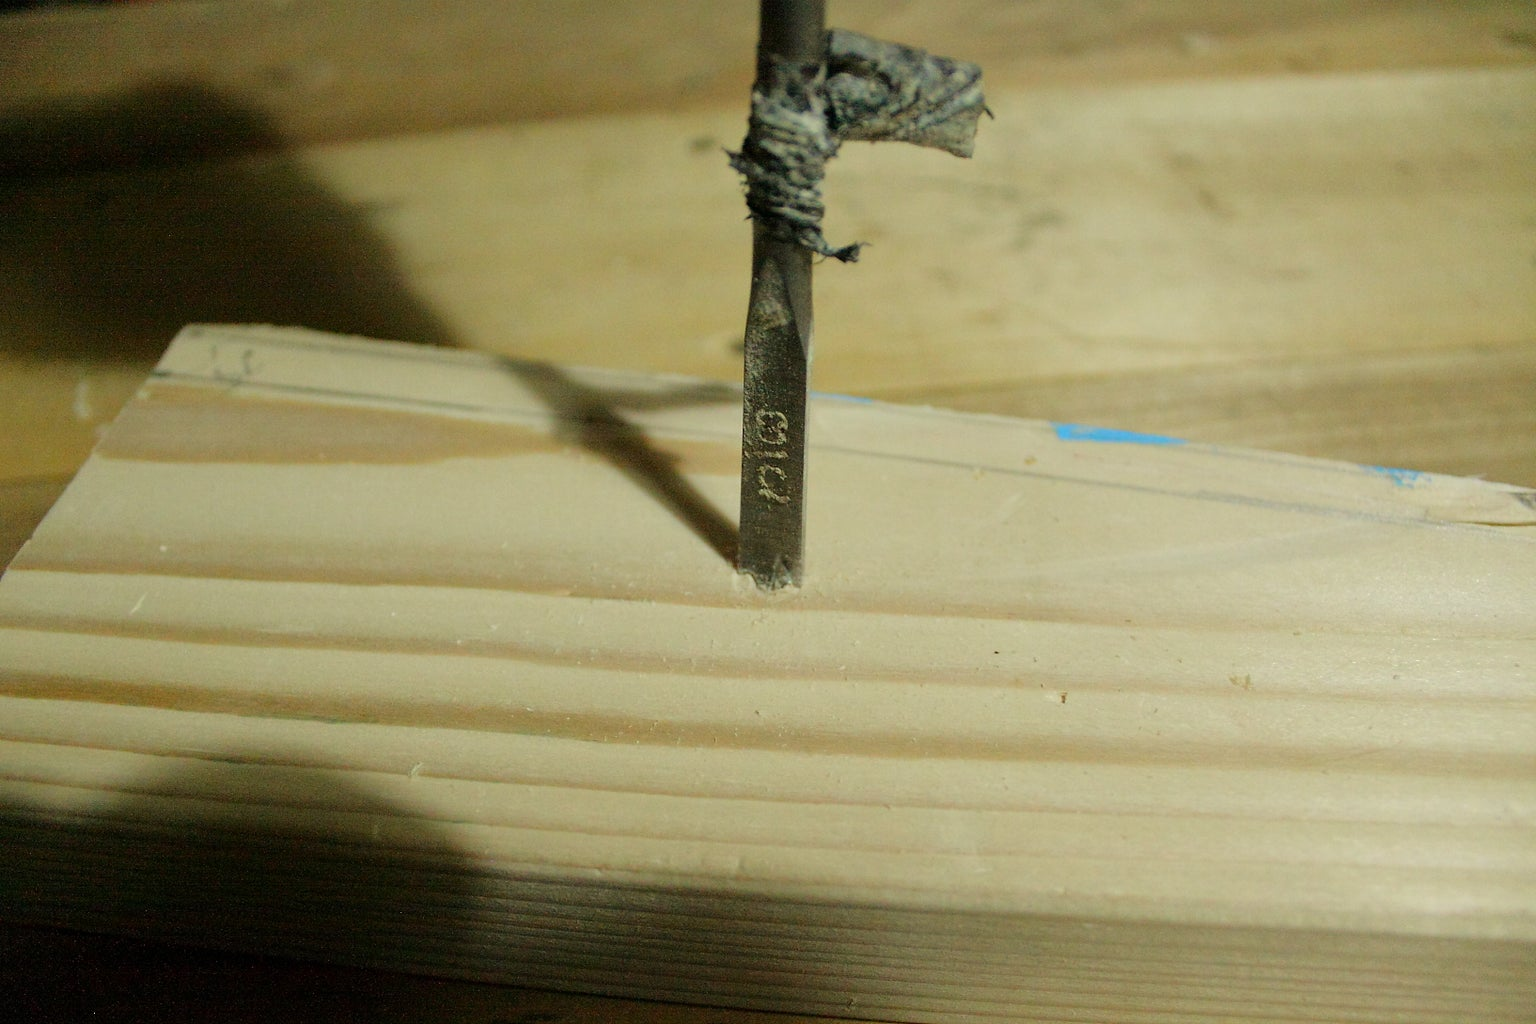 Hiding Screw Heads With Plugs